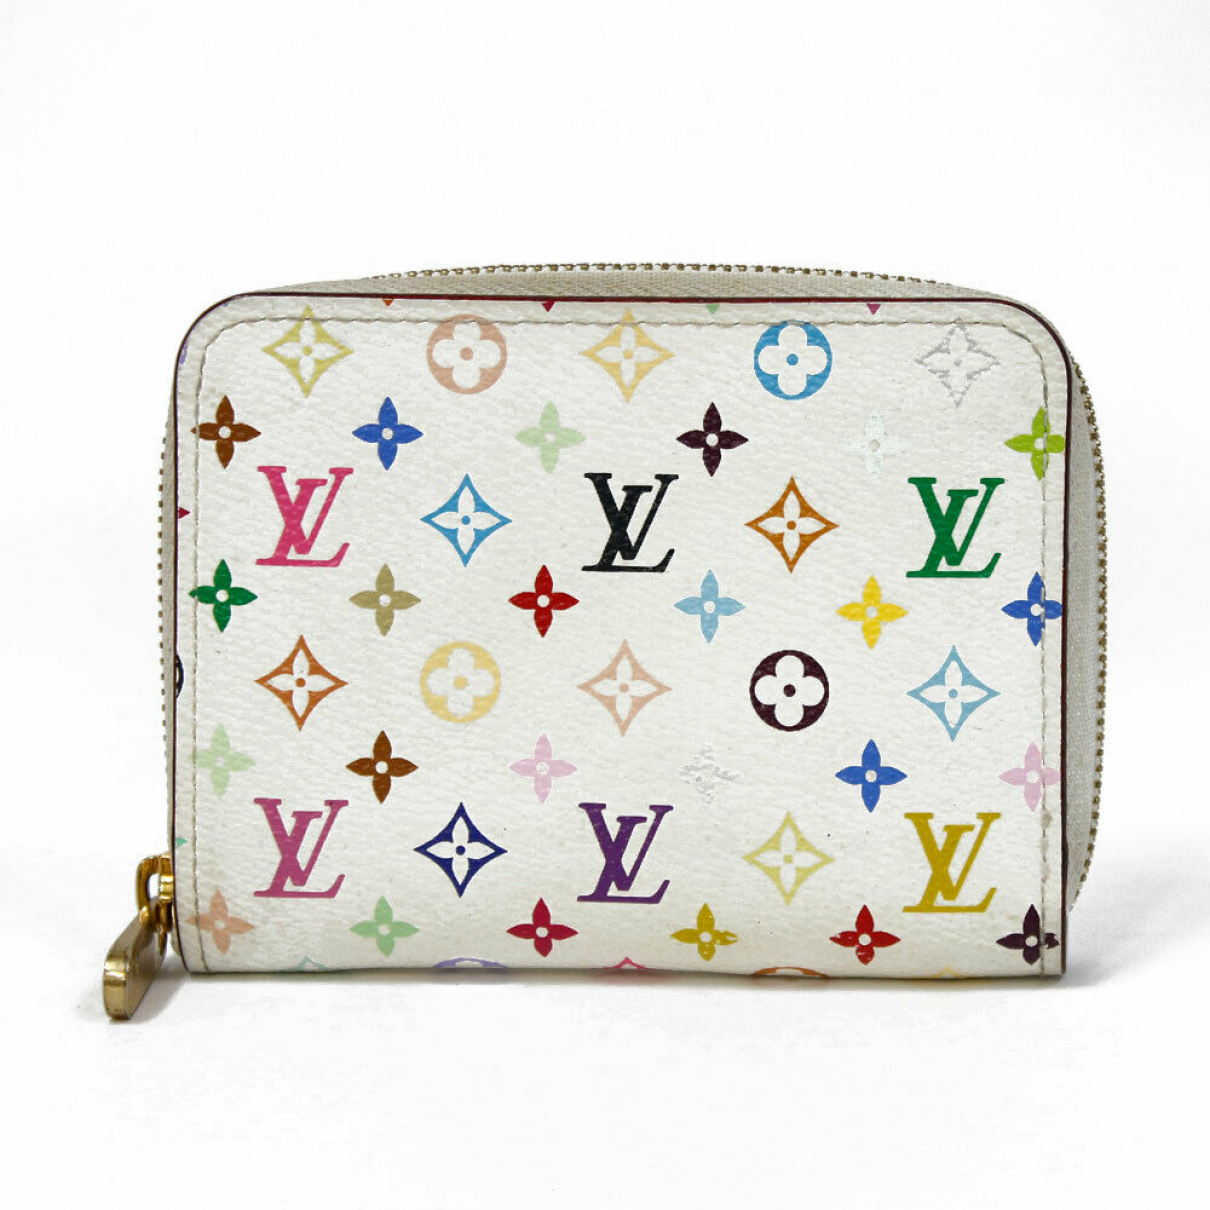 Louis Vuitton \N Kleinlederwaren Andere